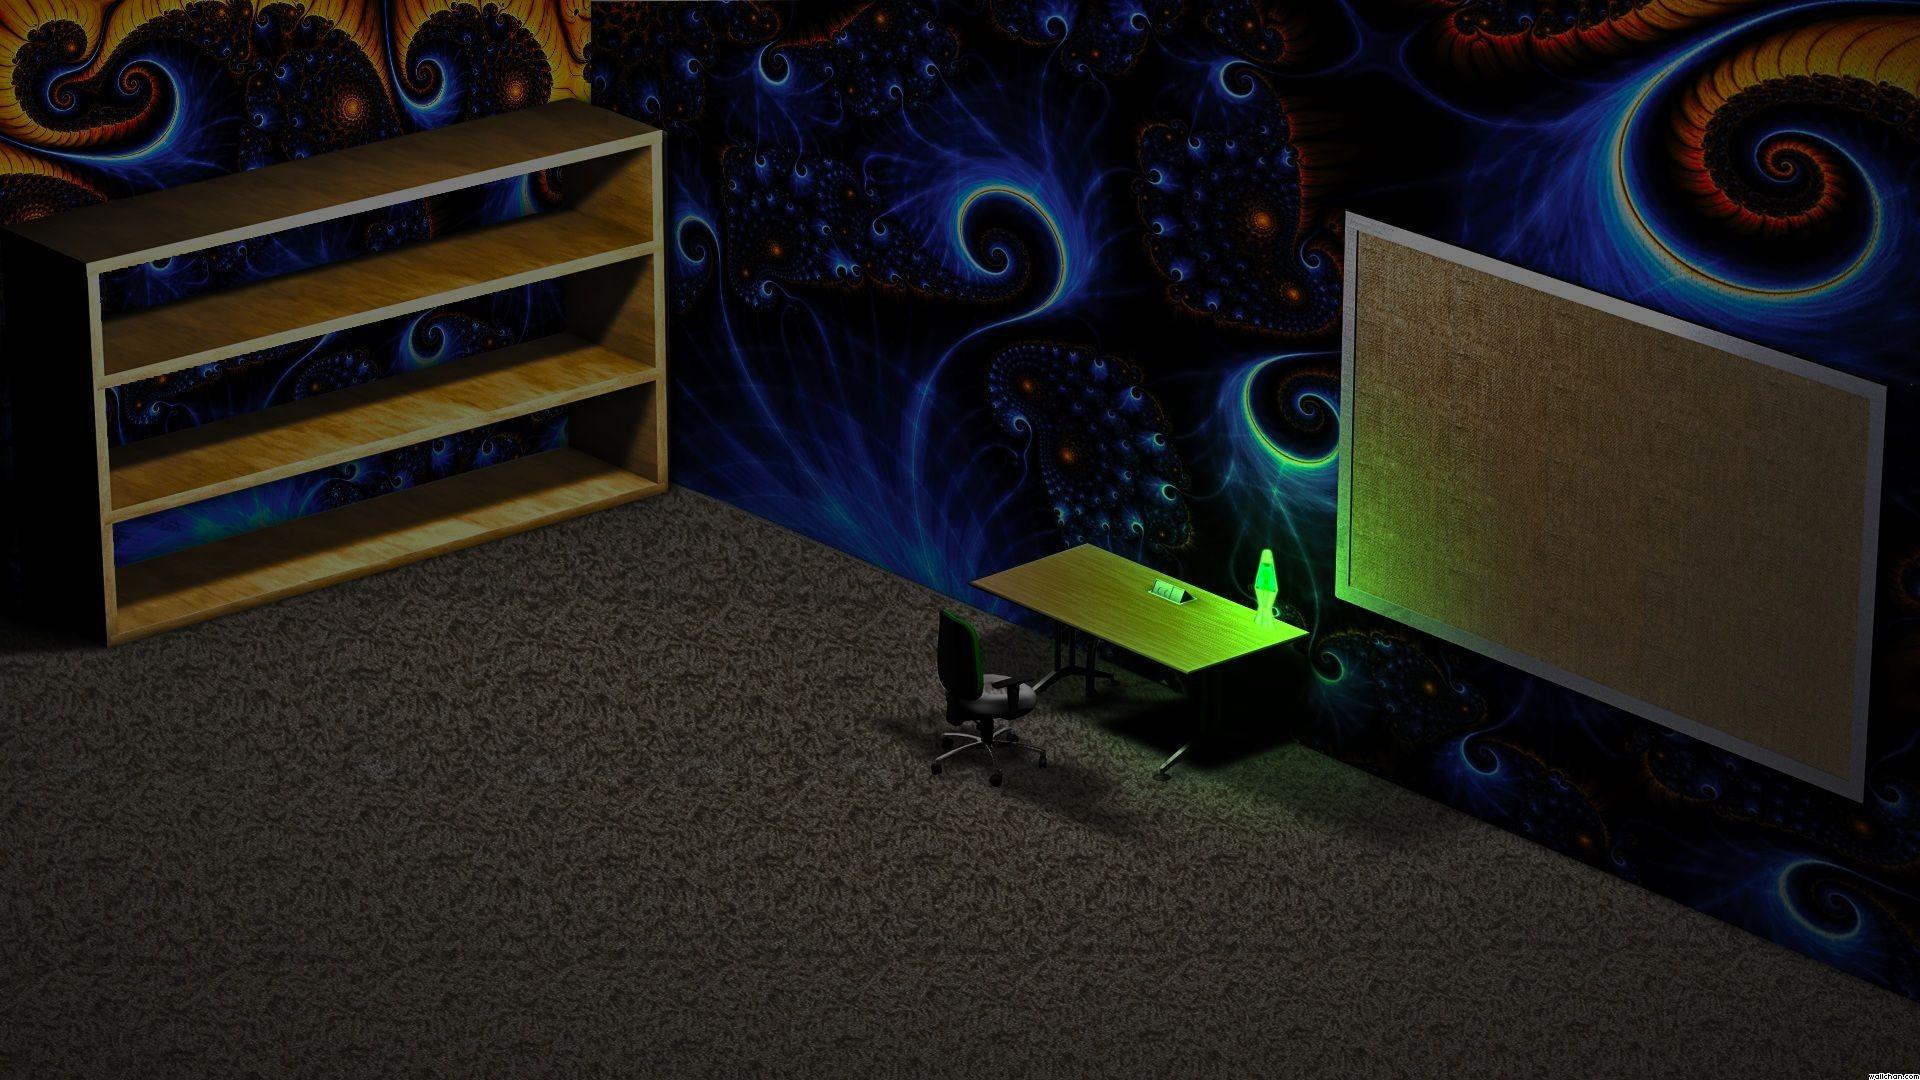 1920x1080 dark desktop background shelves stock vector 79596808 shutterstock